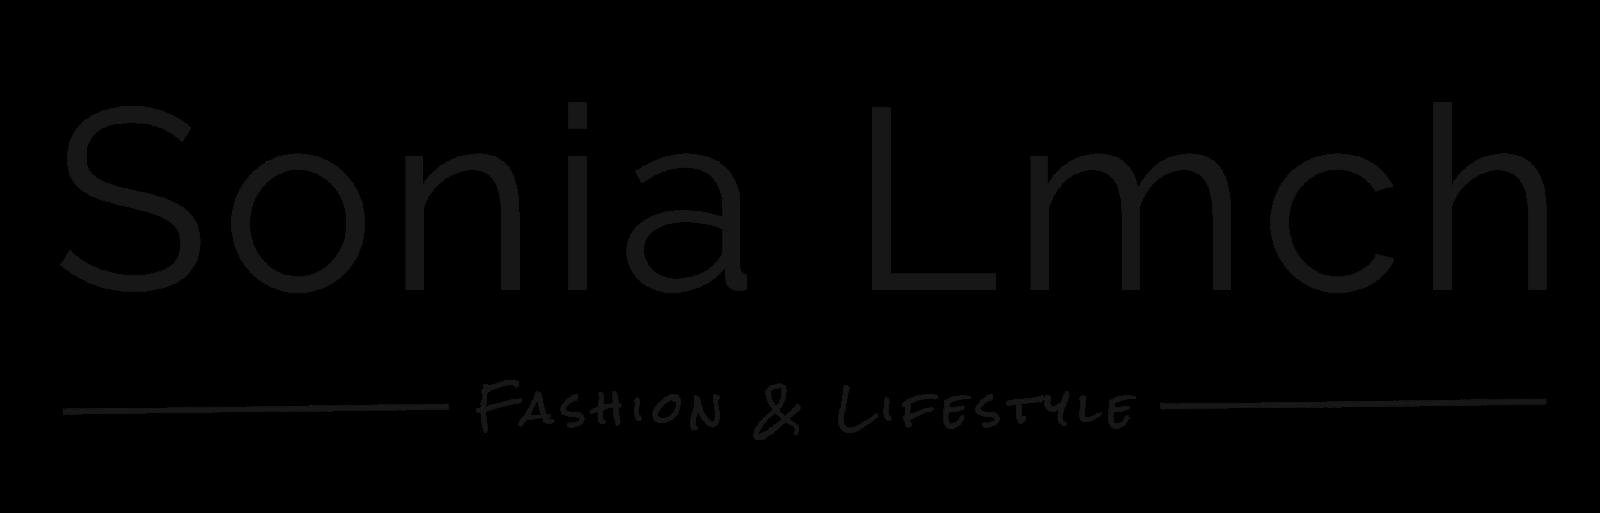 Sonia-Lmch : Blog Mode Bordeaux - Mode - Lifestyle - Beauté - Blogueuse bordelaise - Luxe